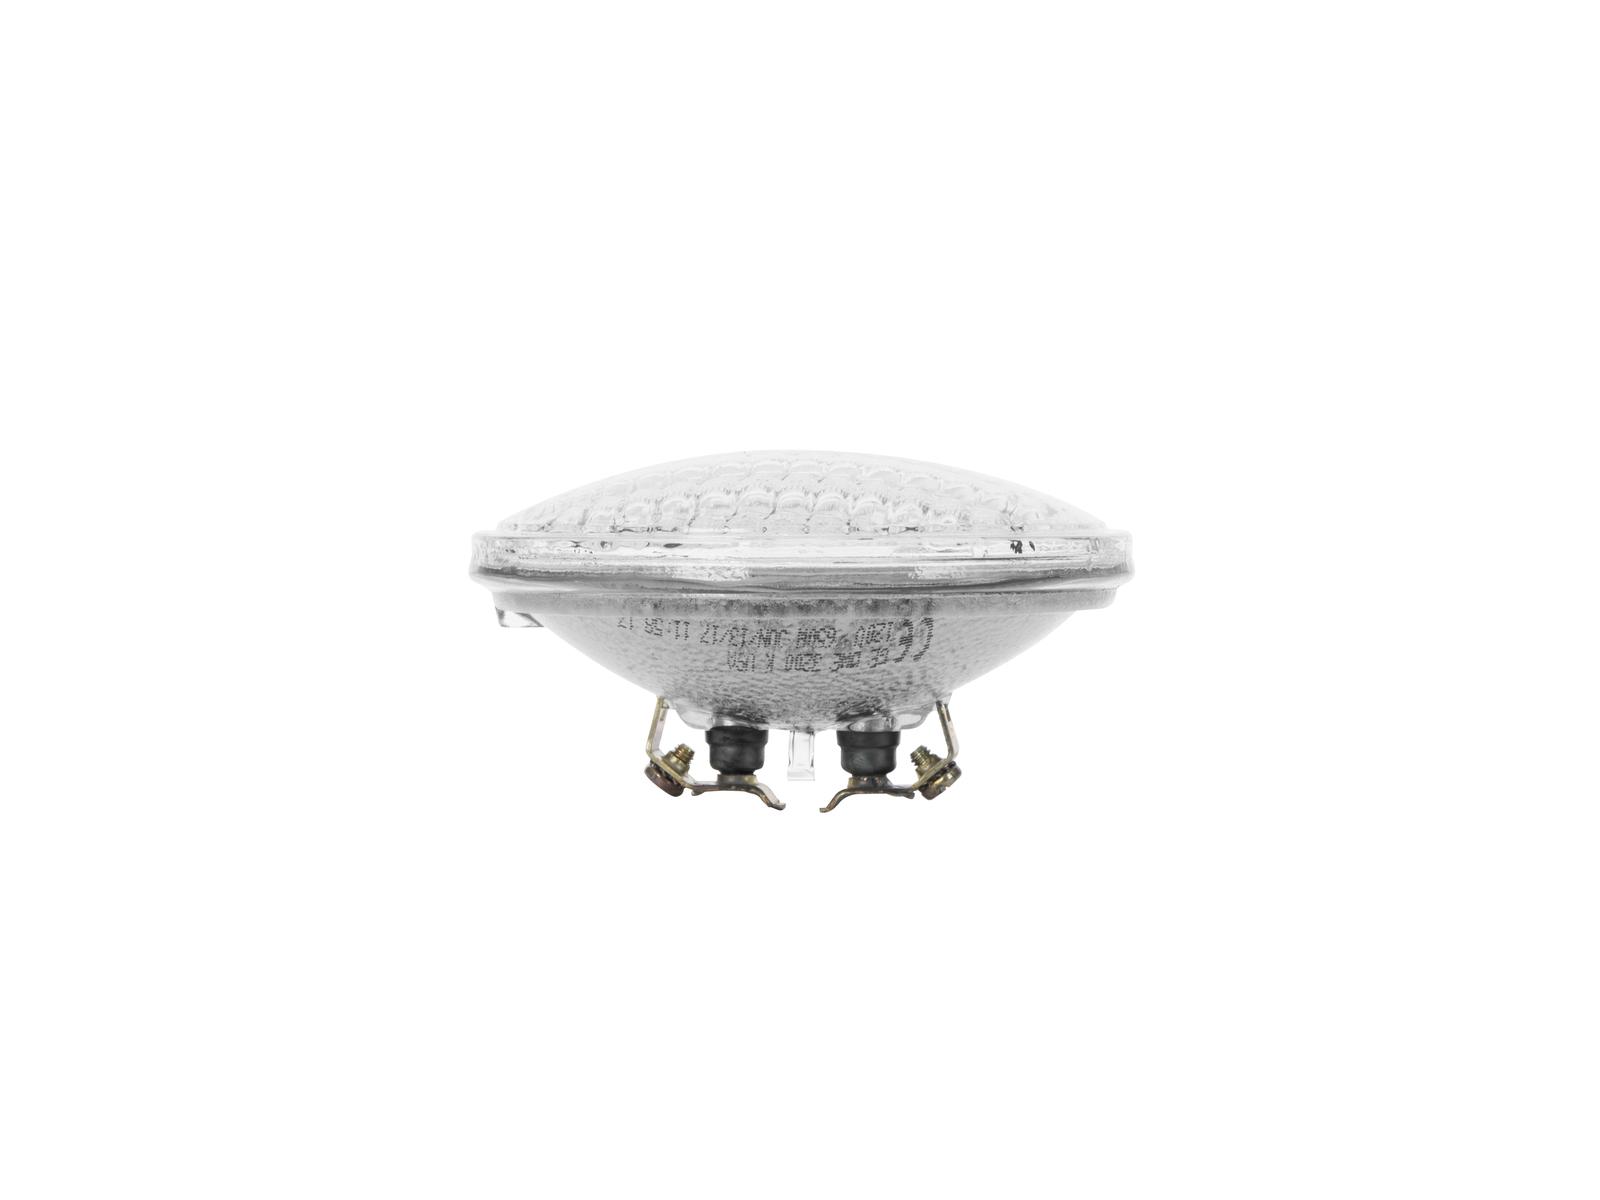 Lampada Faro per PAR-36 GE DWE PAR-36 120V/650W WFL 100h 3200 K